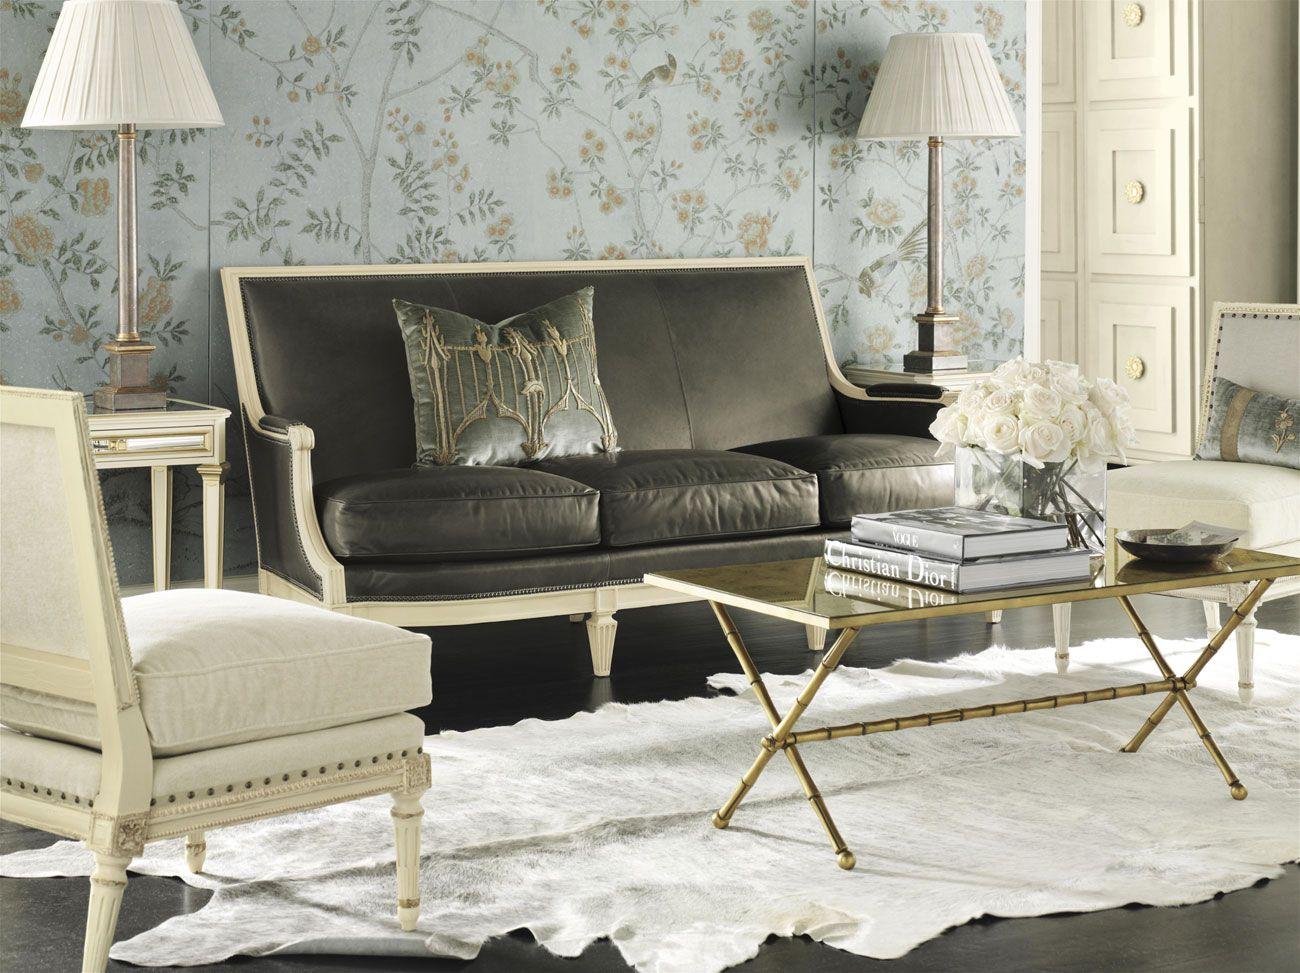 De gournay: available through your professional interior design